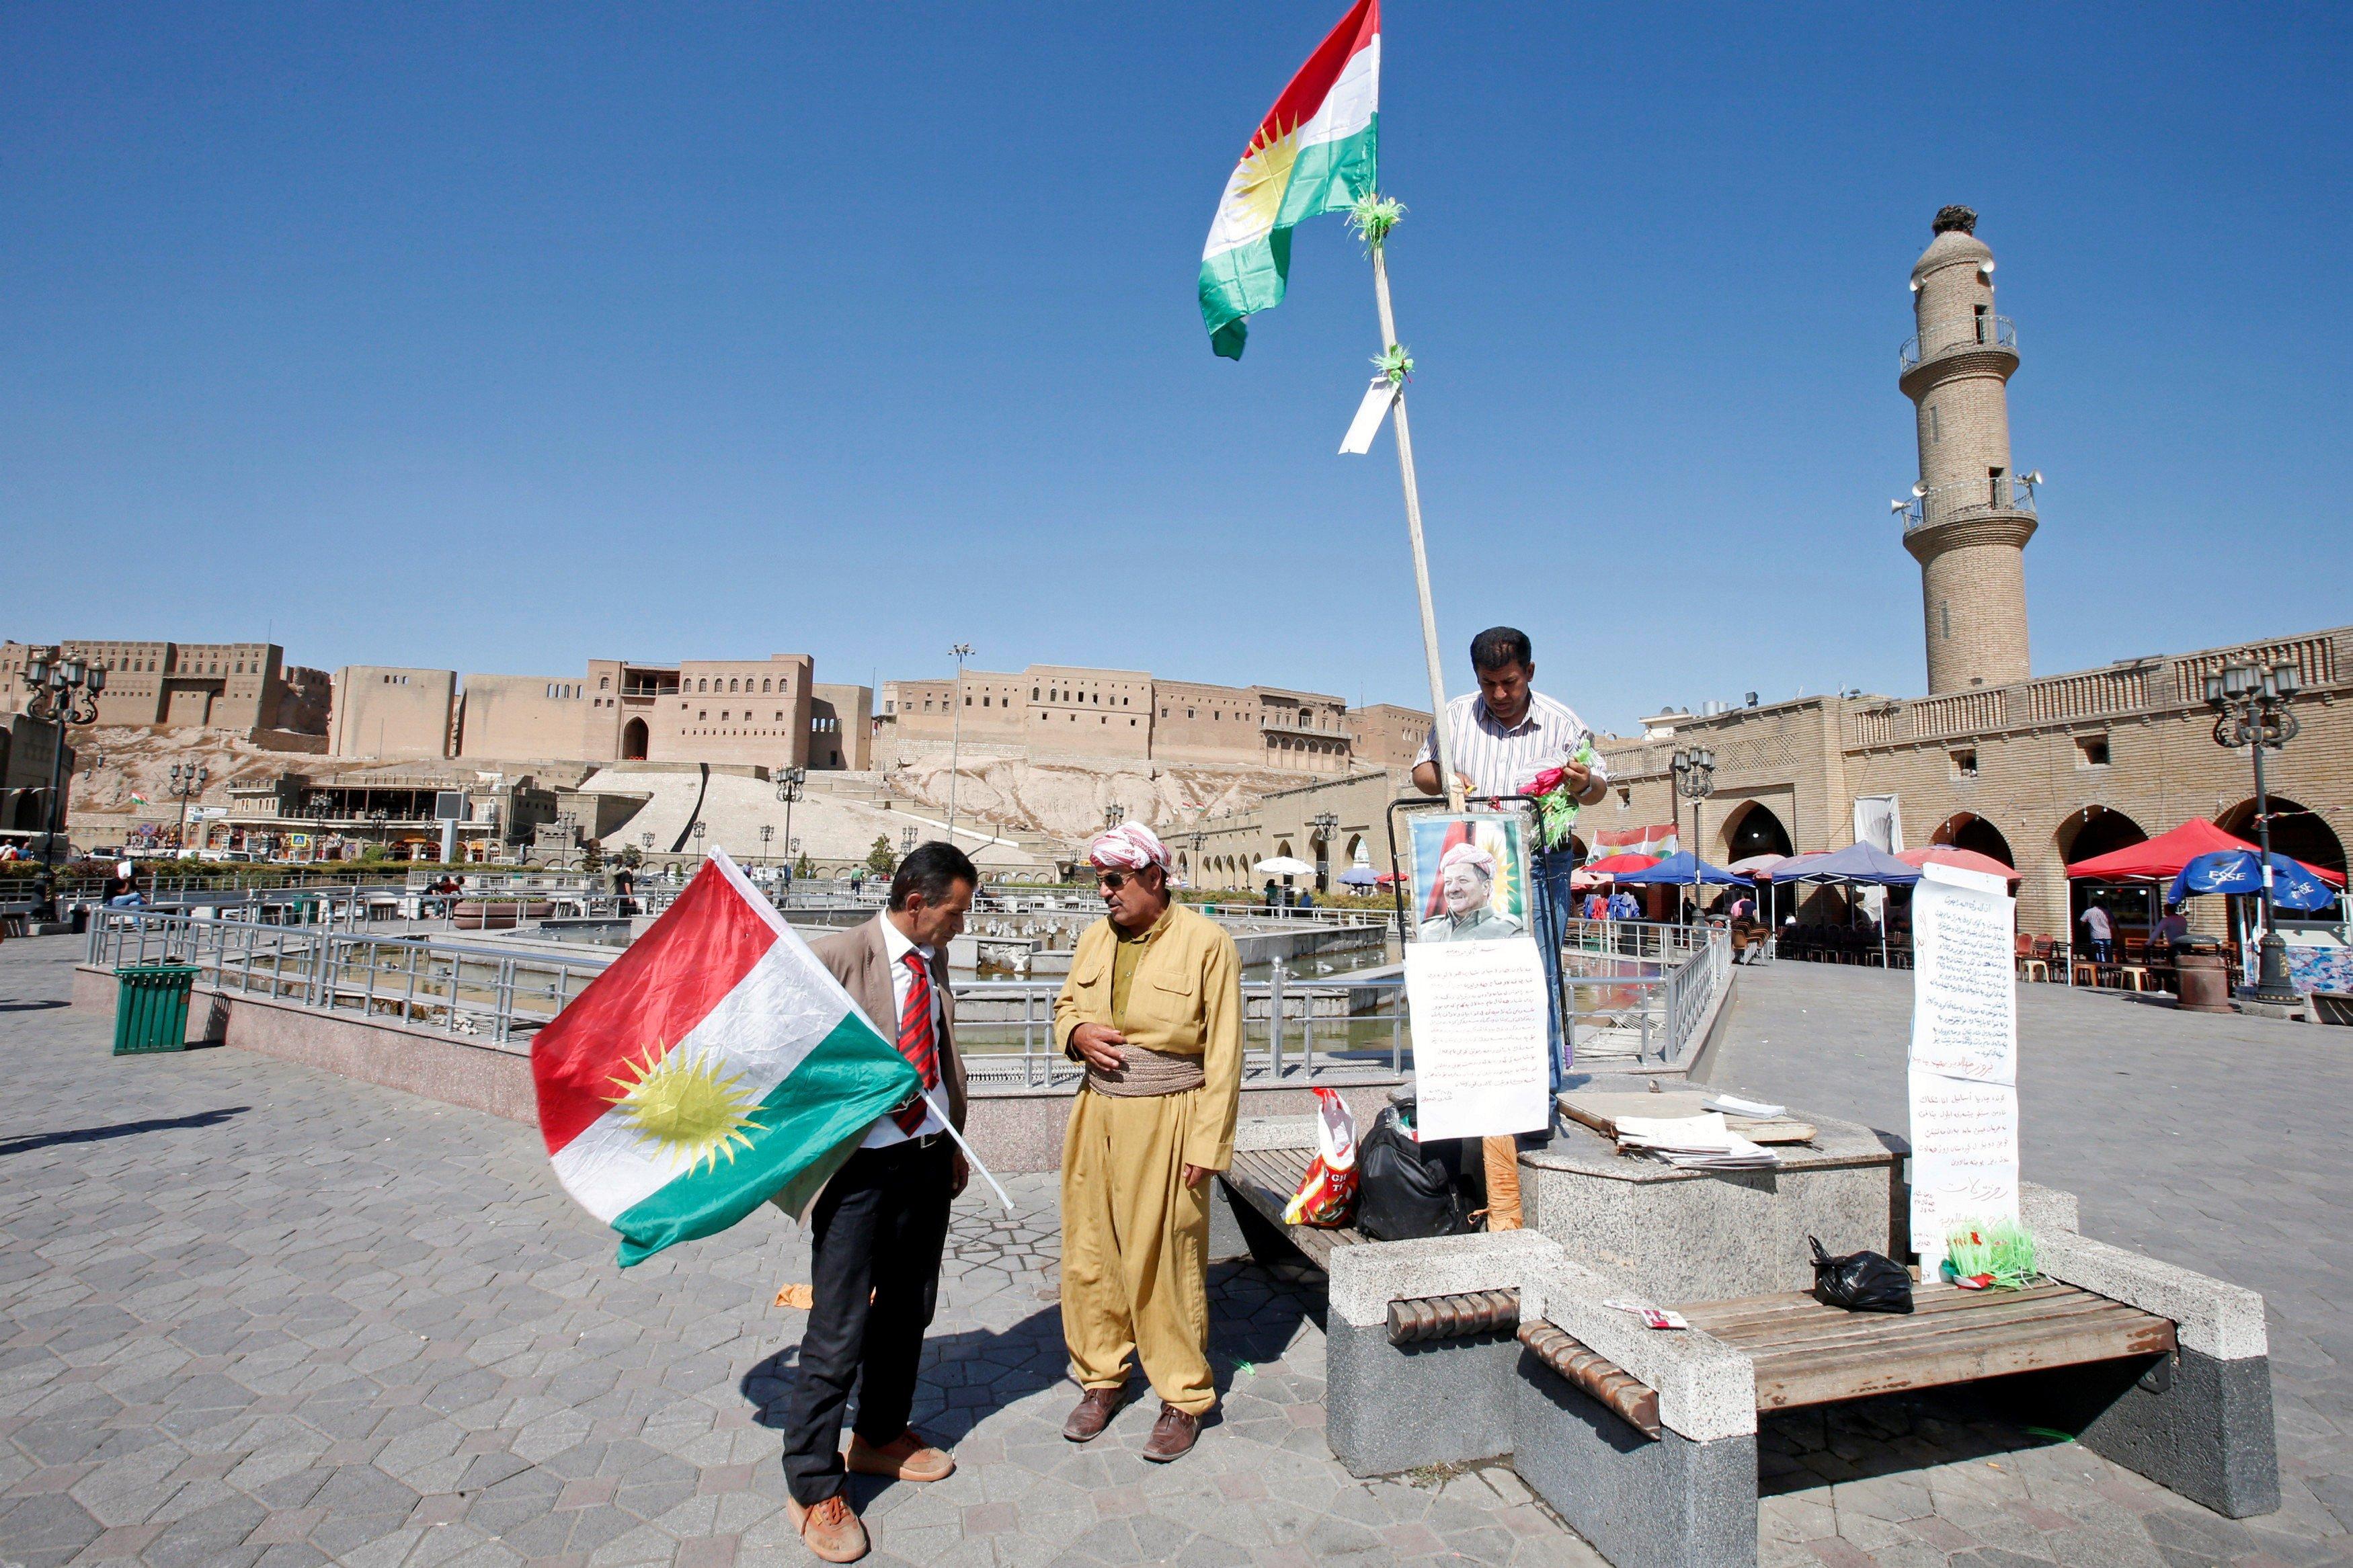 США призвали Ирак иКурдистан к уменьшению напряжённости